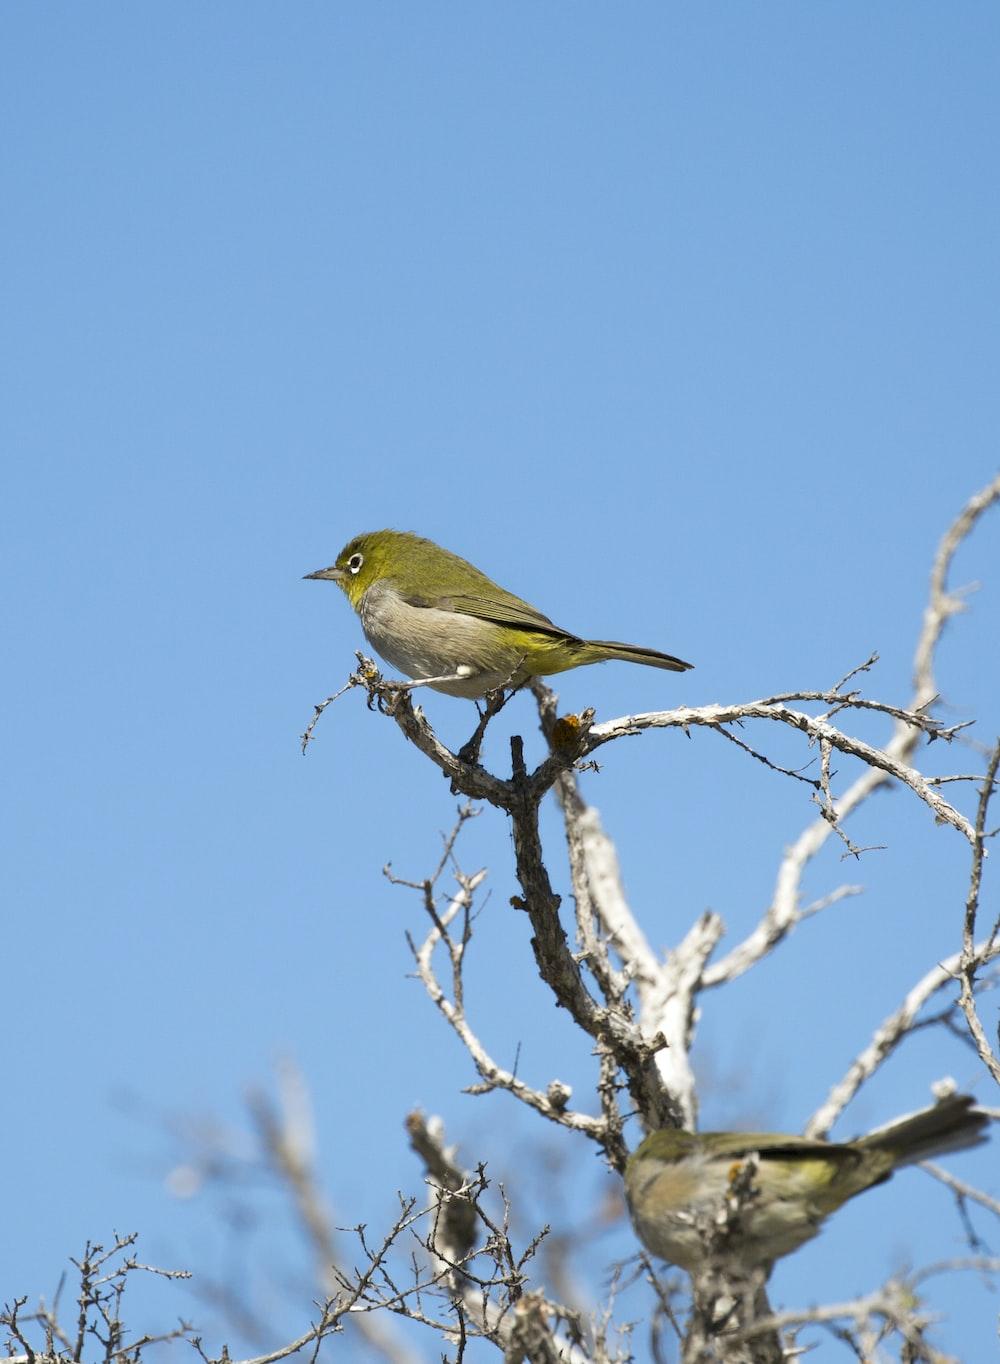 Green Bird Photo Free Bird Image On Unsplash